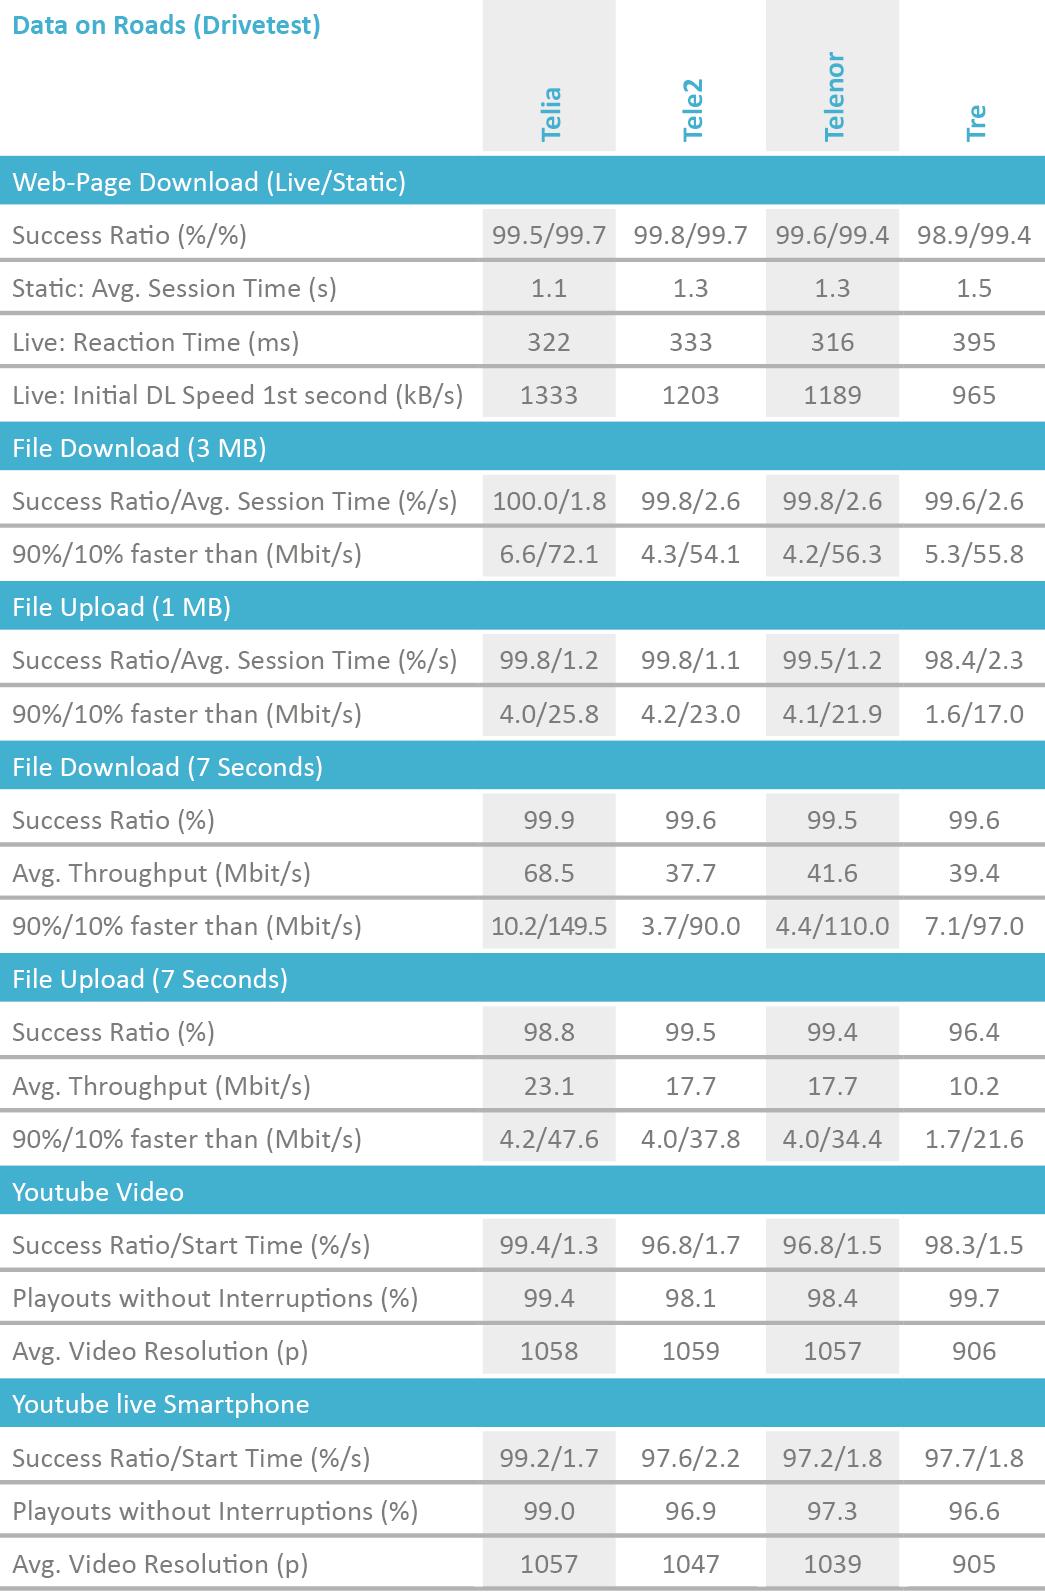 SE2019_table_DataRoads_Drivetest.png